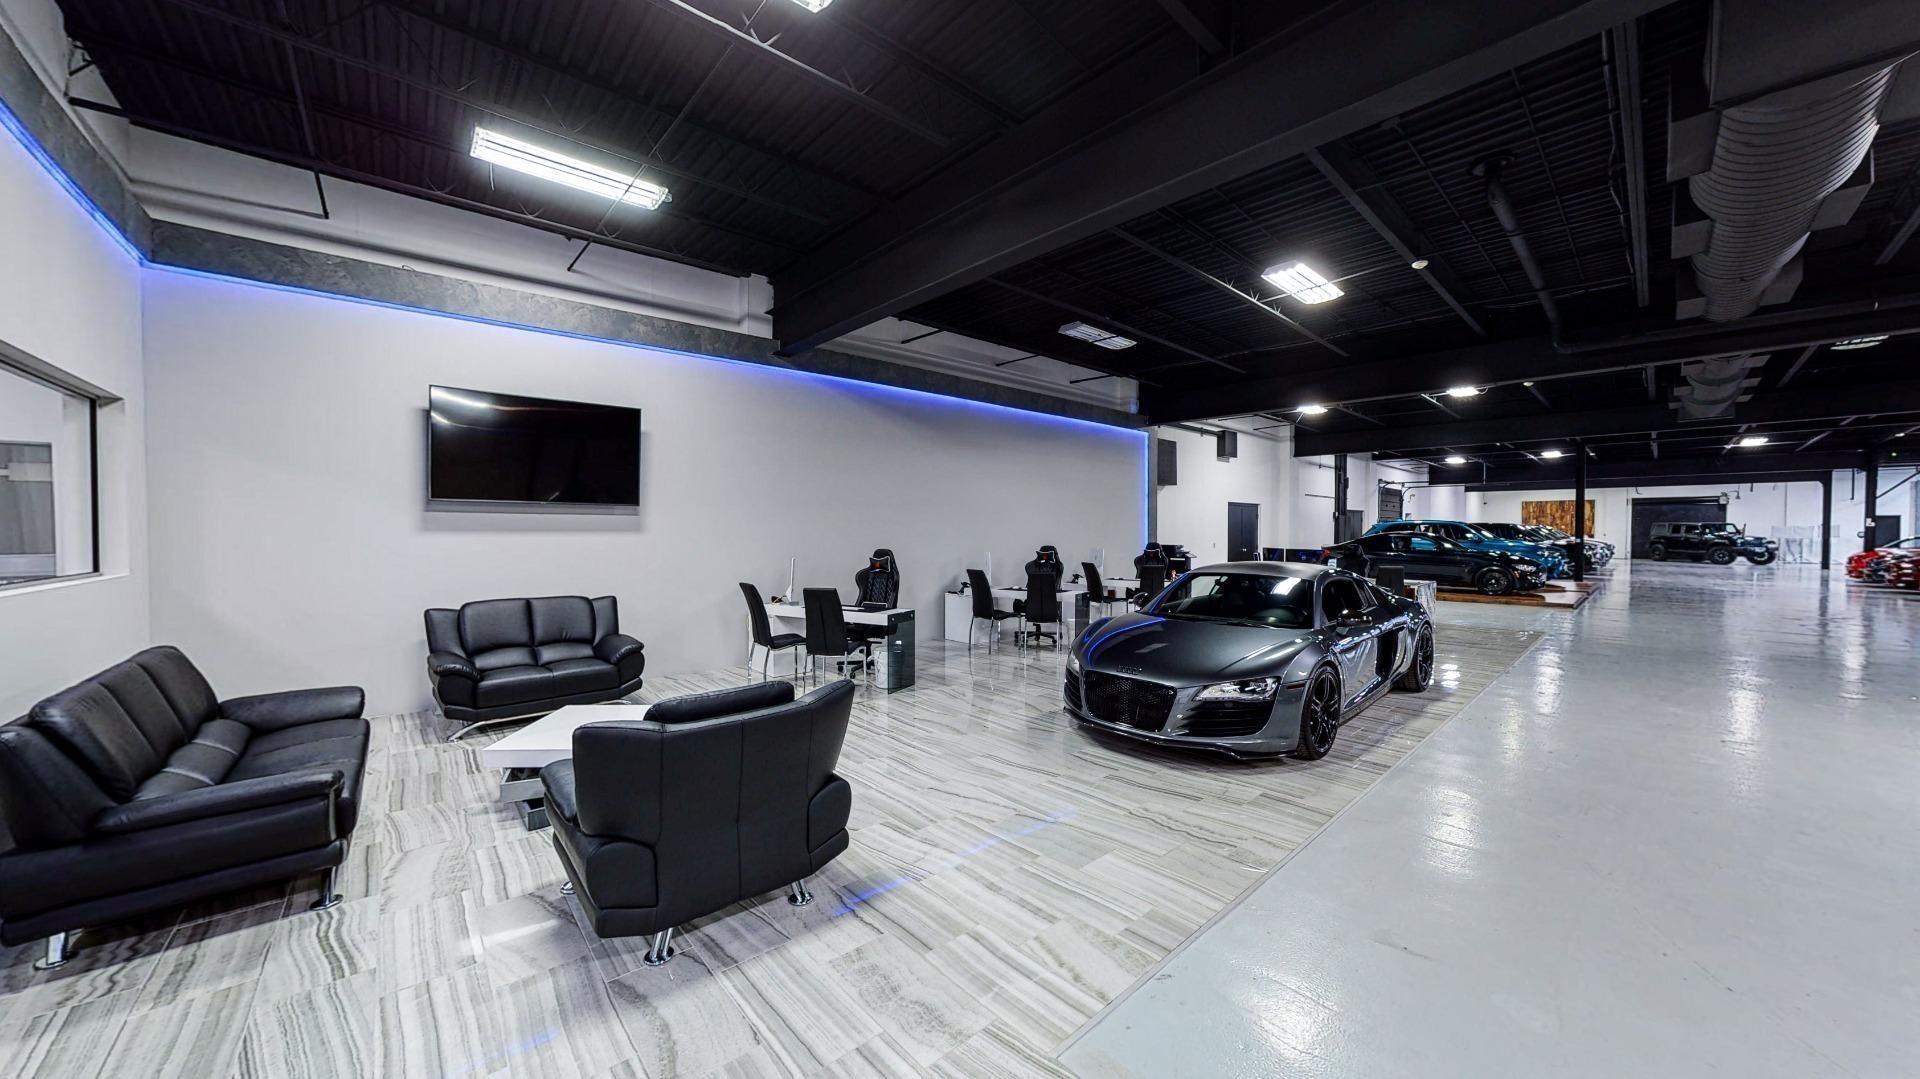 Used 2018 Audi Q5 2.0T quattro Premium Plus for sale $31,995 at Perfect Auto Collection in Akron OH 44310 4